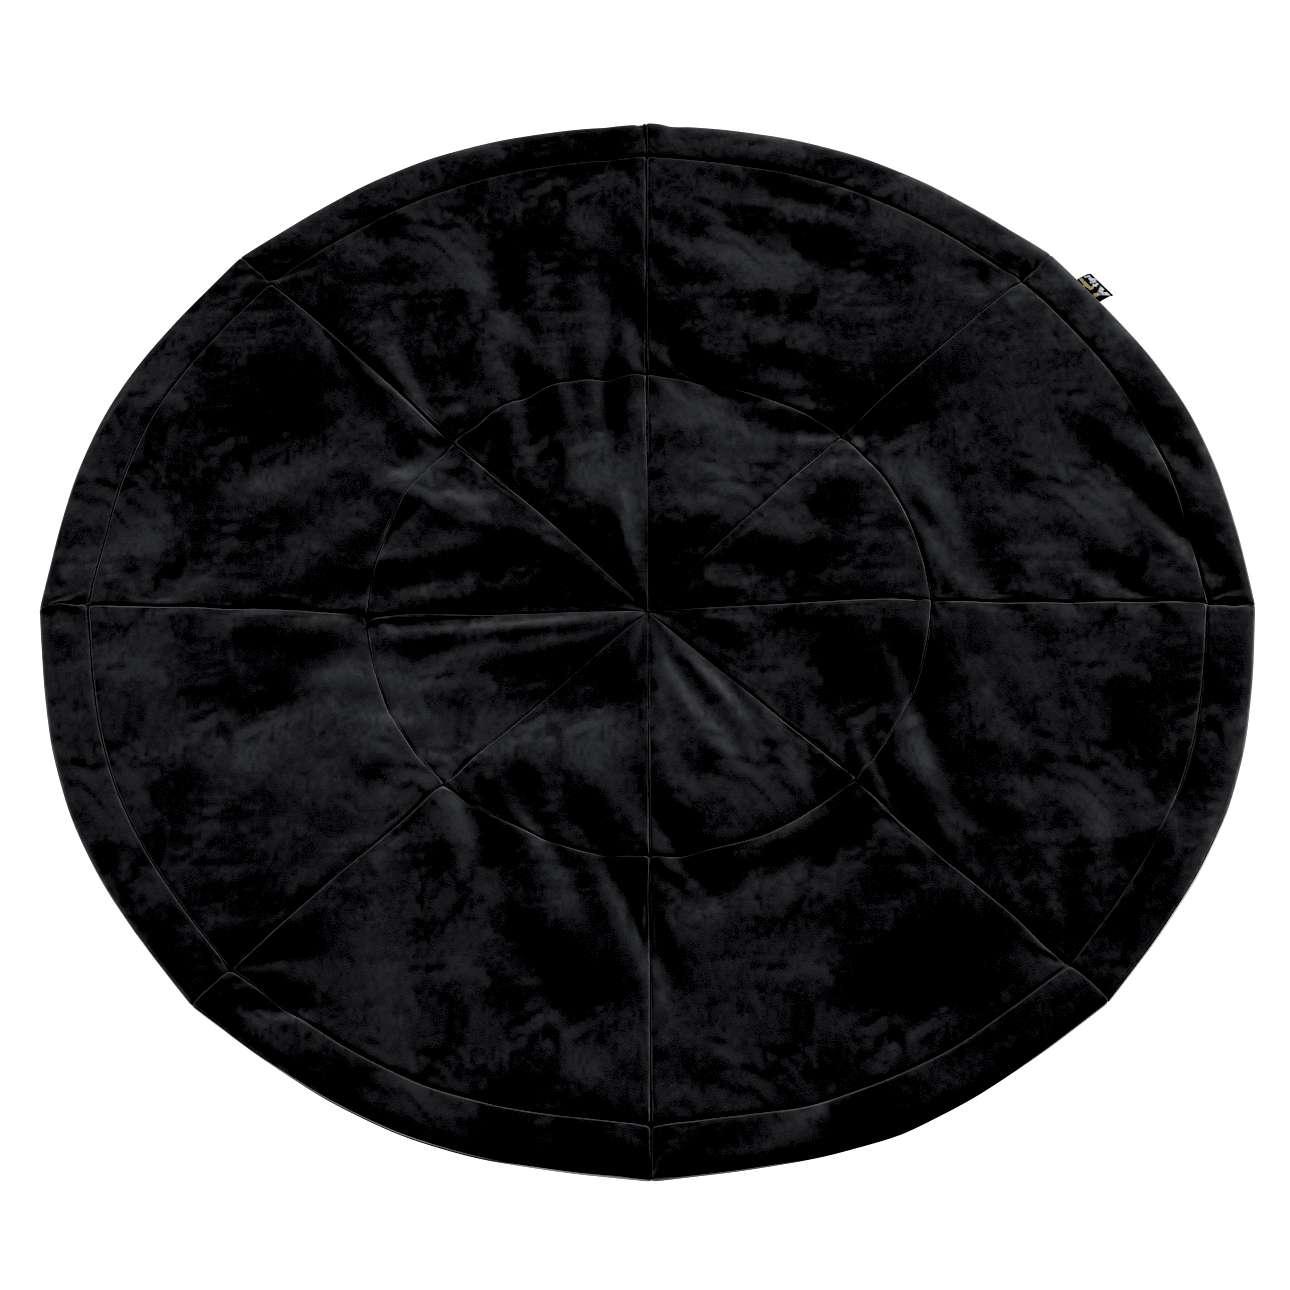 Round mat in collection Posh Velvet, fabric: 704-17